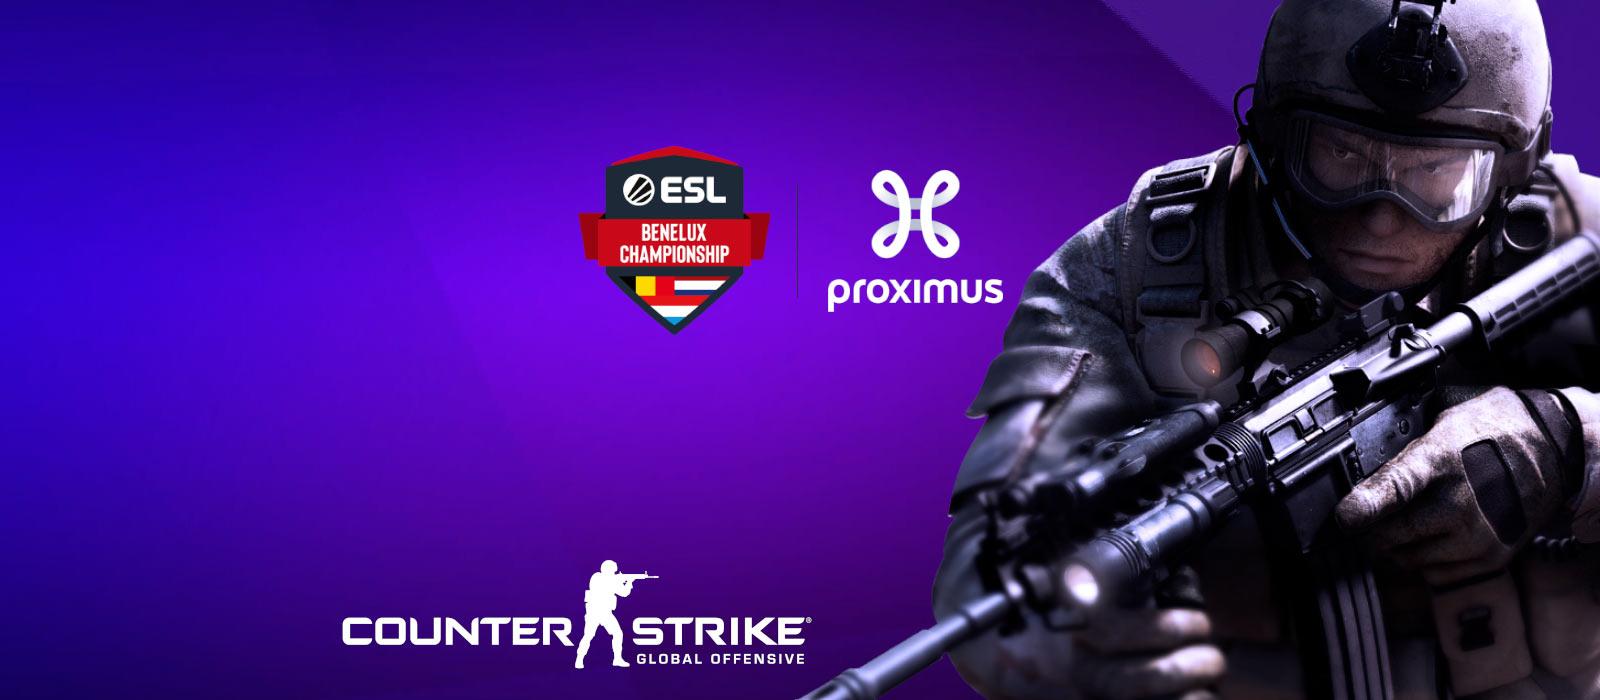 ESL Proximus Benelux Championship